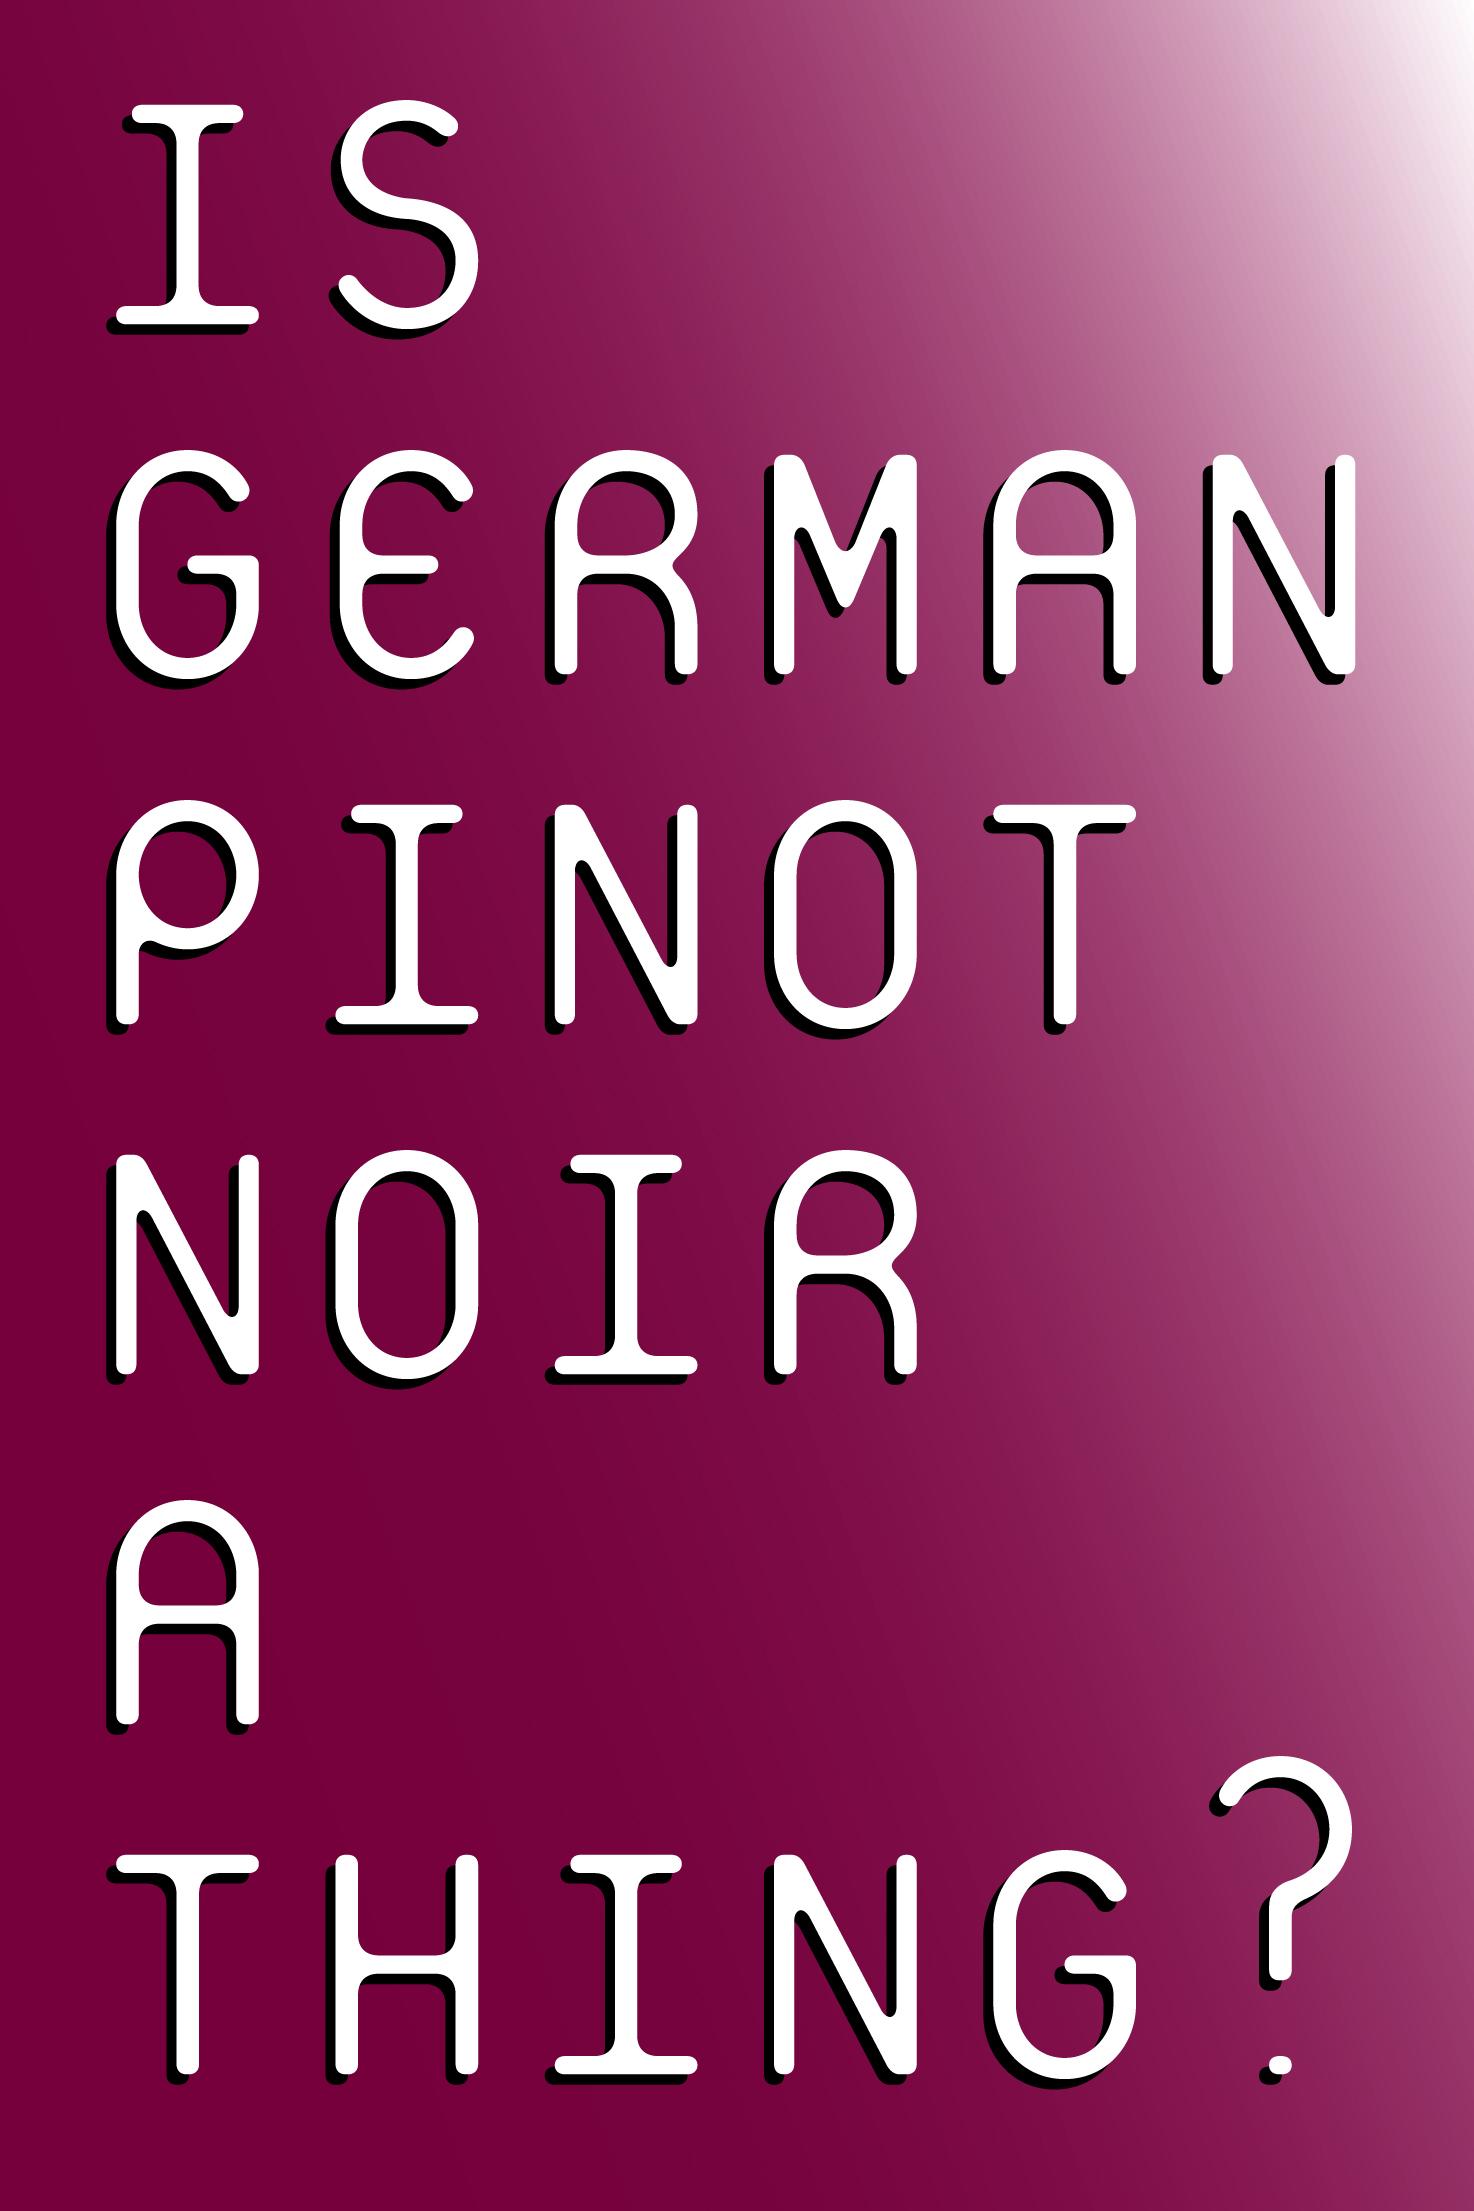 Austrian and German Pinot Noir Tasting